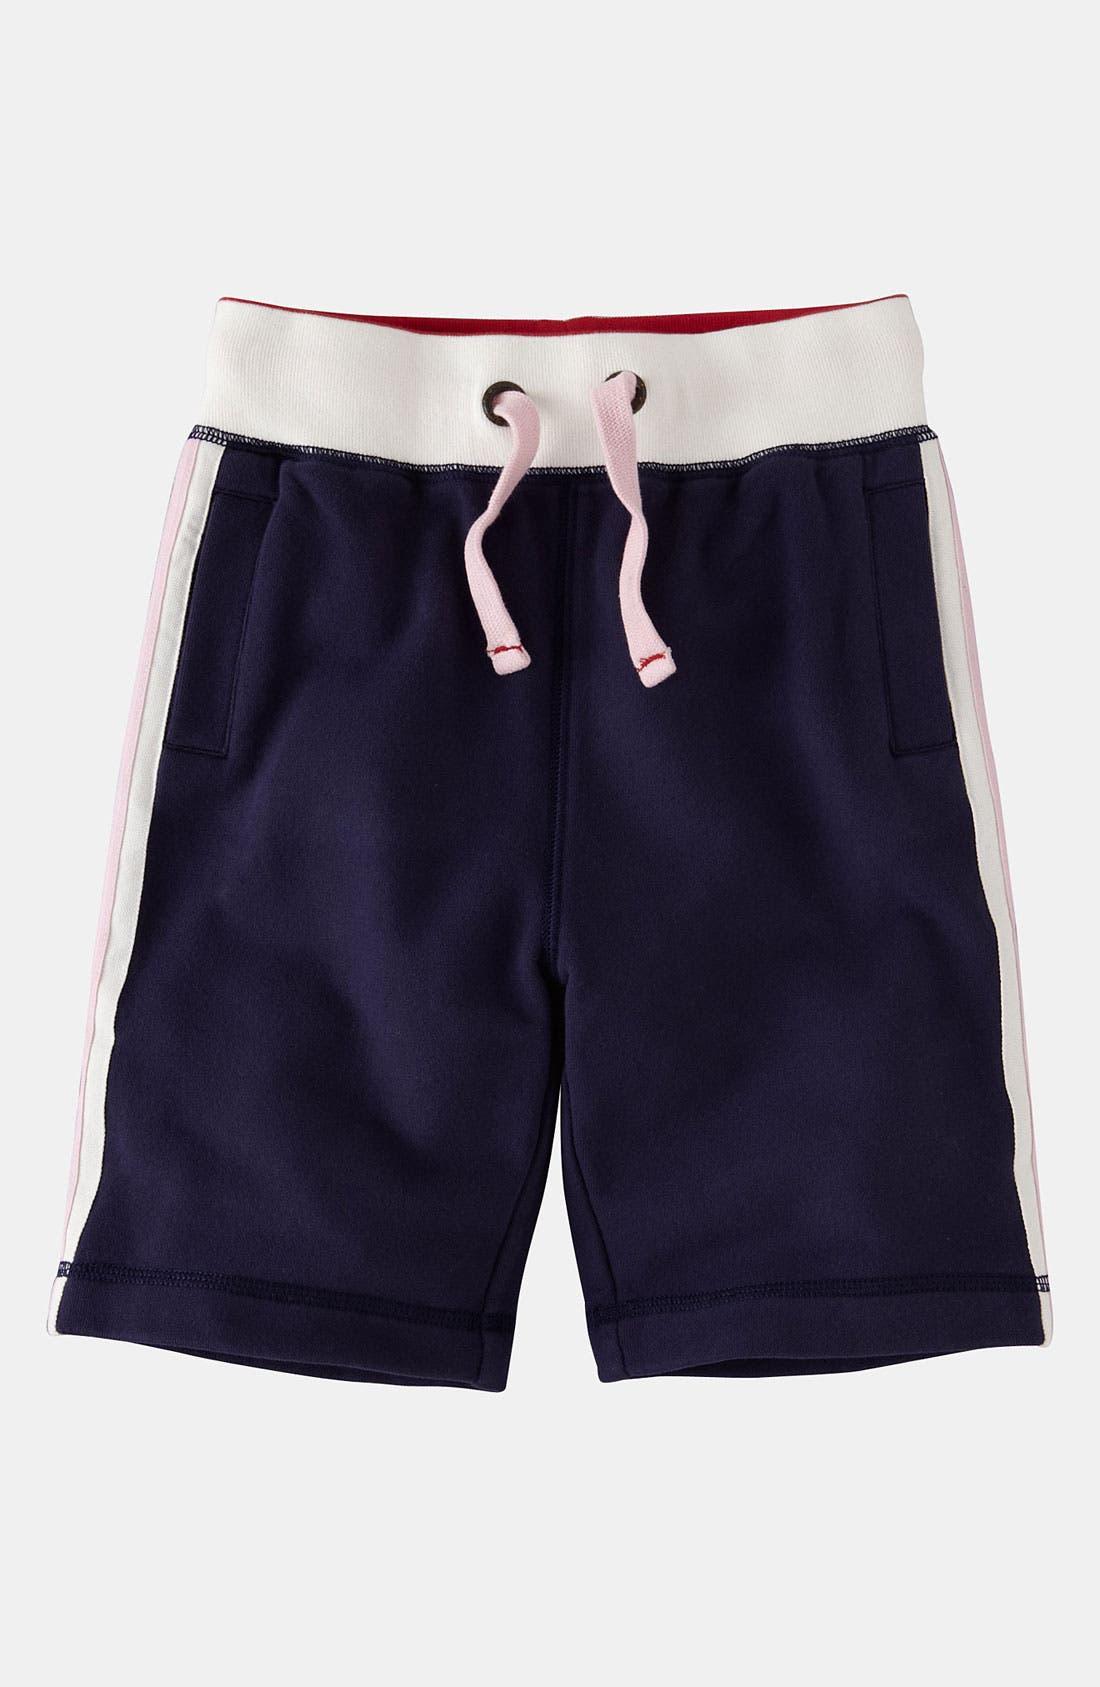 Main Image - Johnnie b Jersey Shorts (Big Boys)